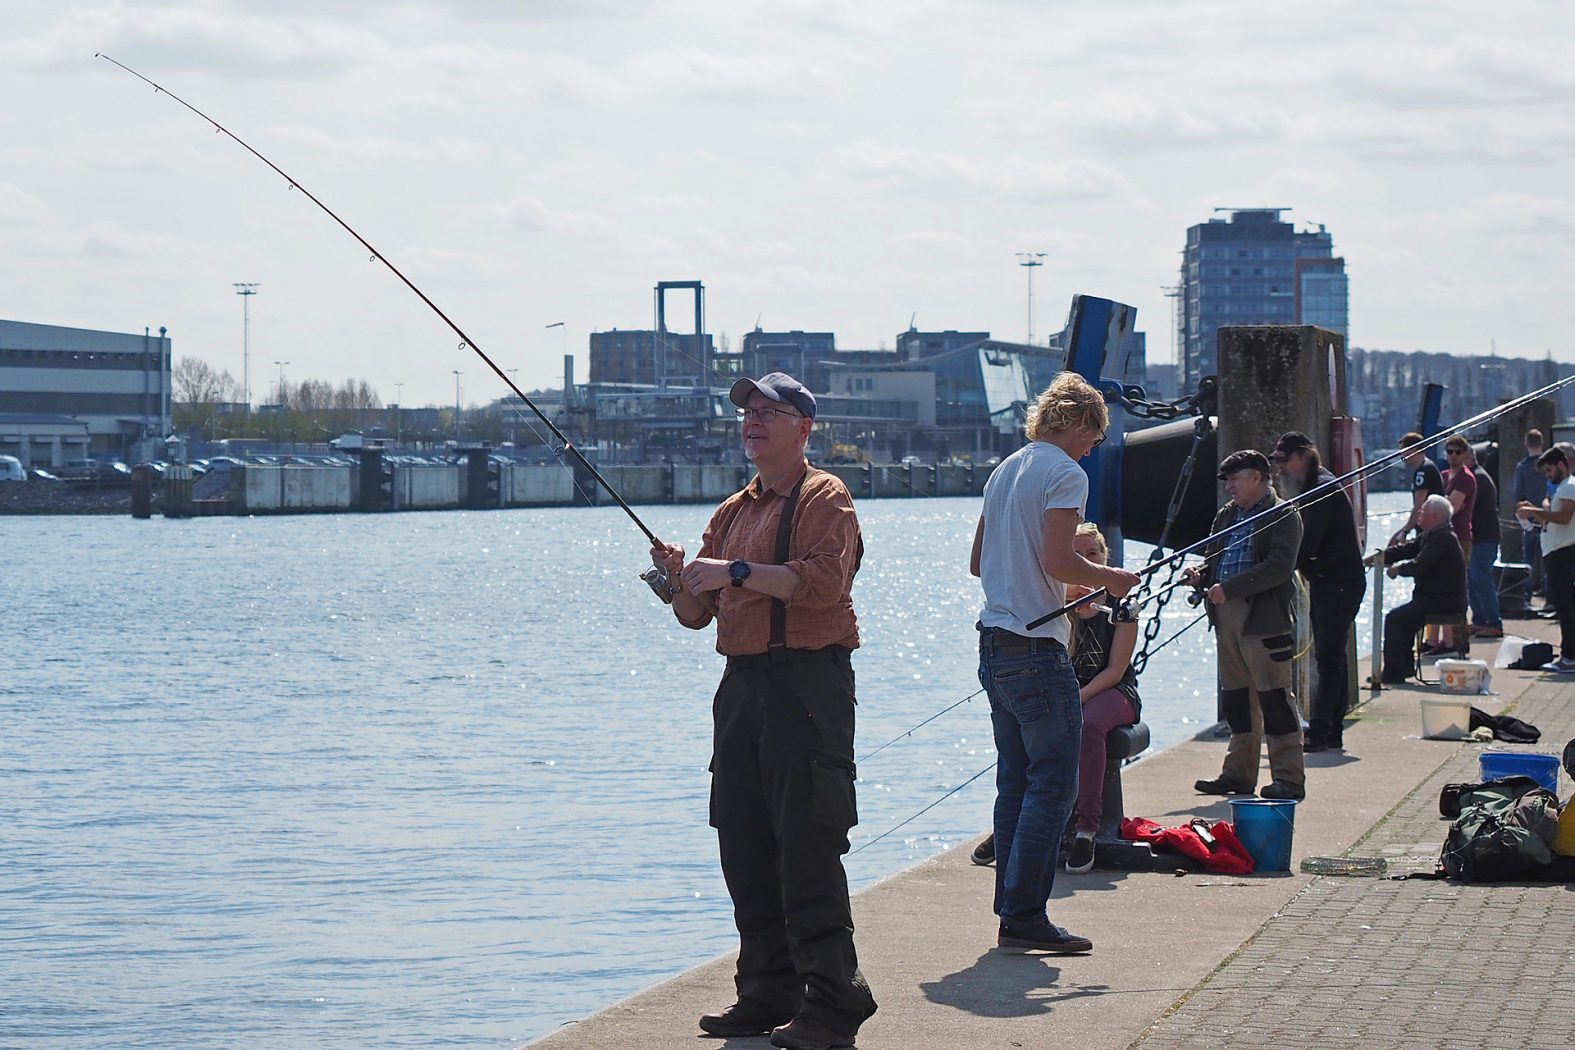 Heringe fangen an der Ostsee